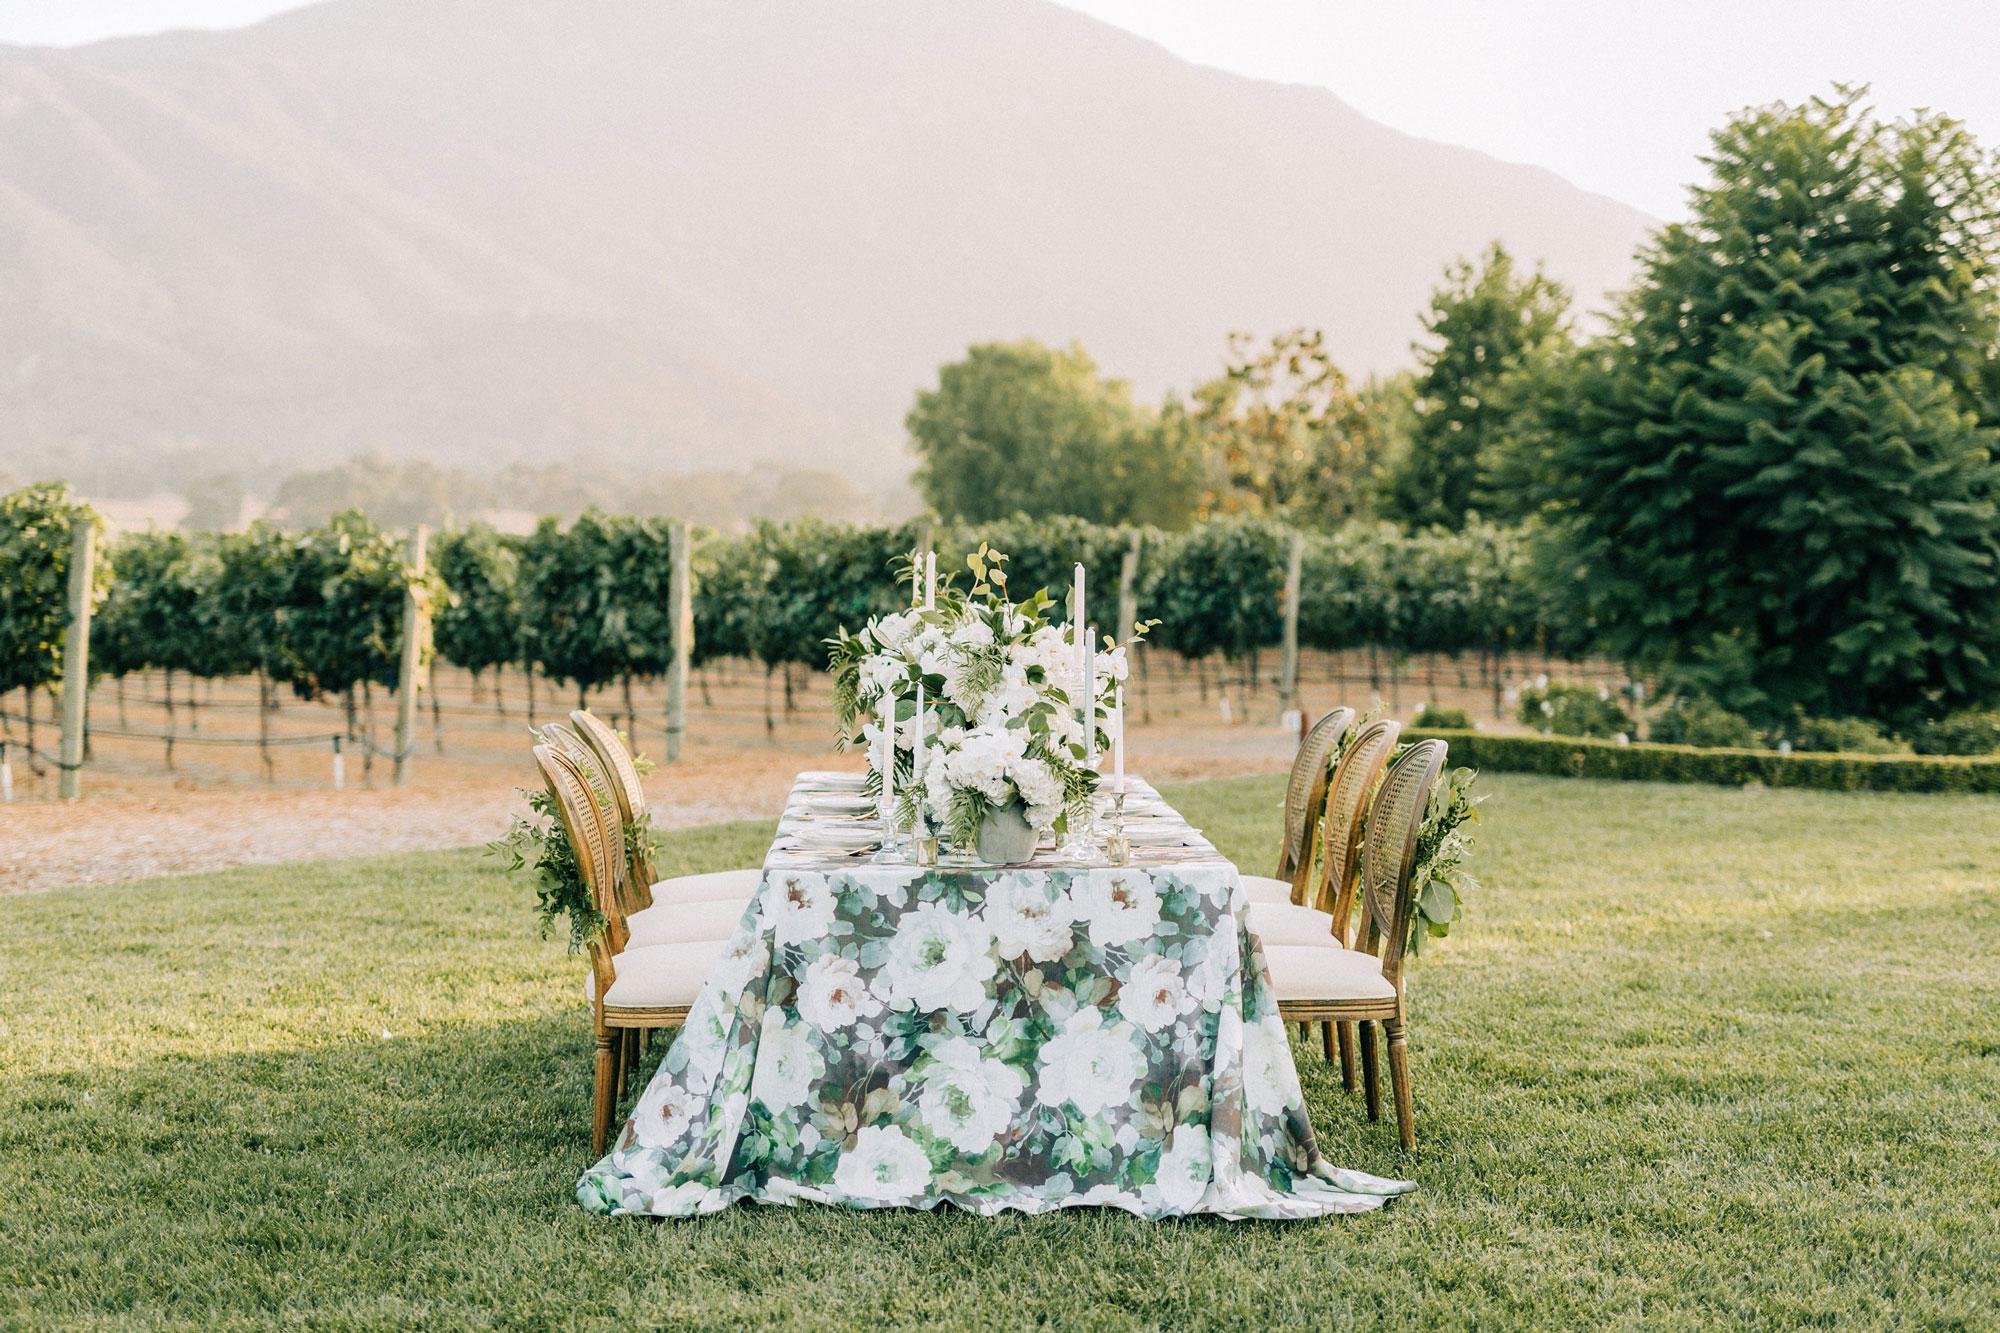 Vineyard Wedding Table